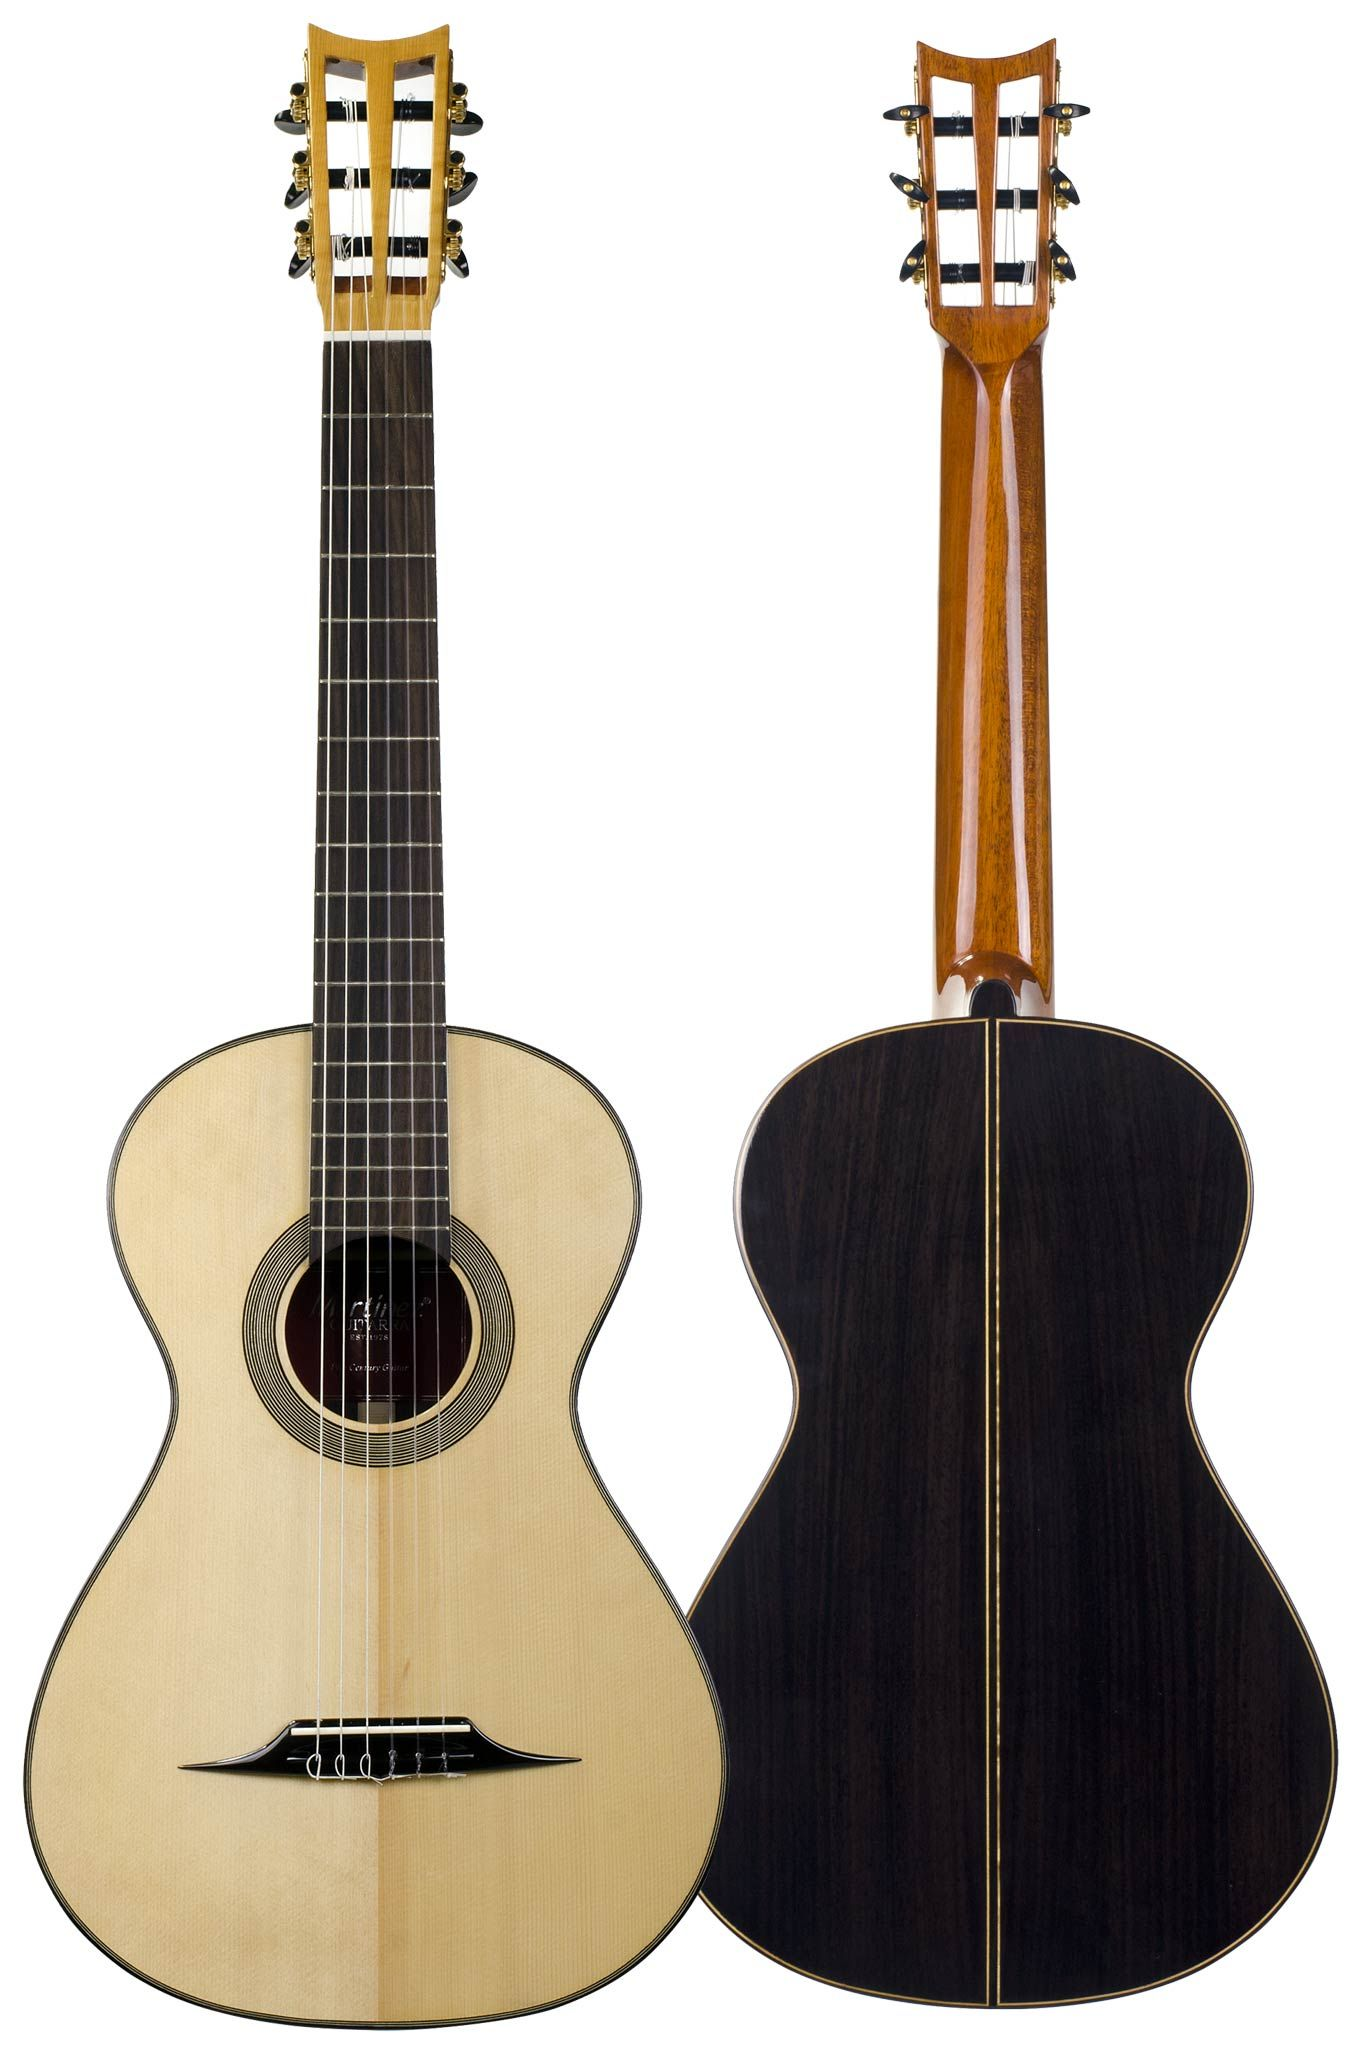 Martinez Romantic Classical Guitar Replica Of Lacote Model 19th Century With A Very Peculiar Sound Vintage Guitars Classic Guitar Classical Acoustic Guitar